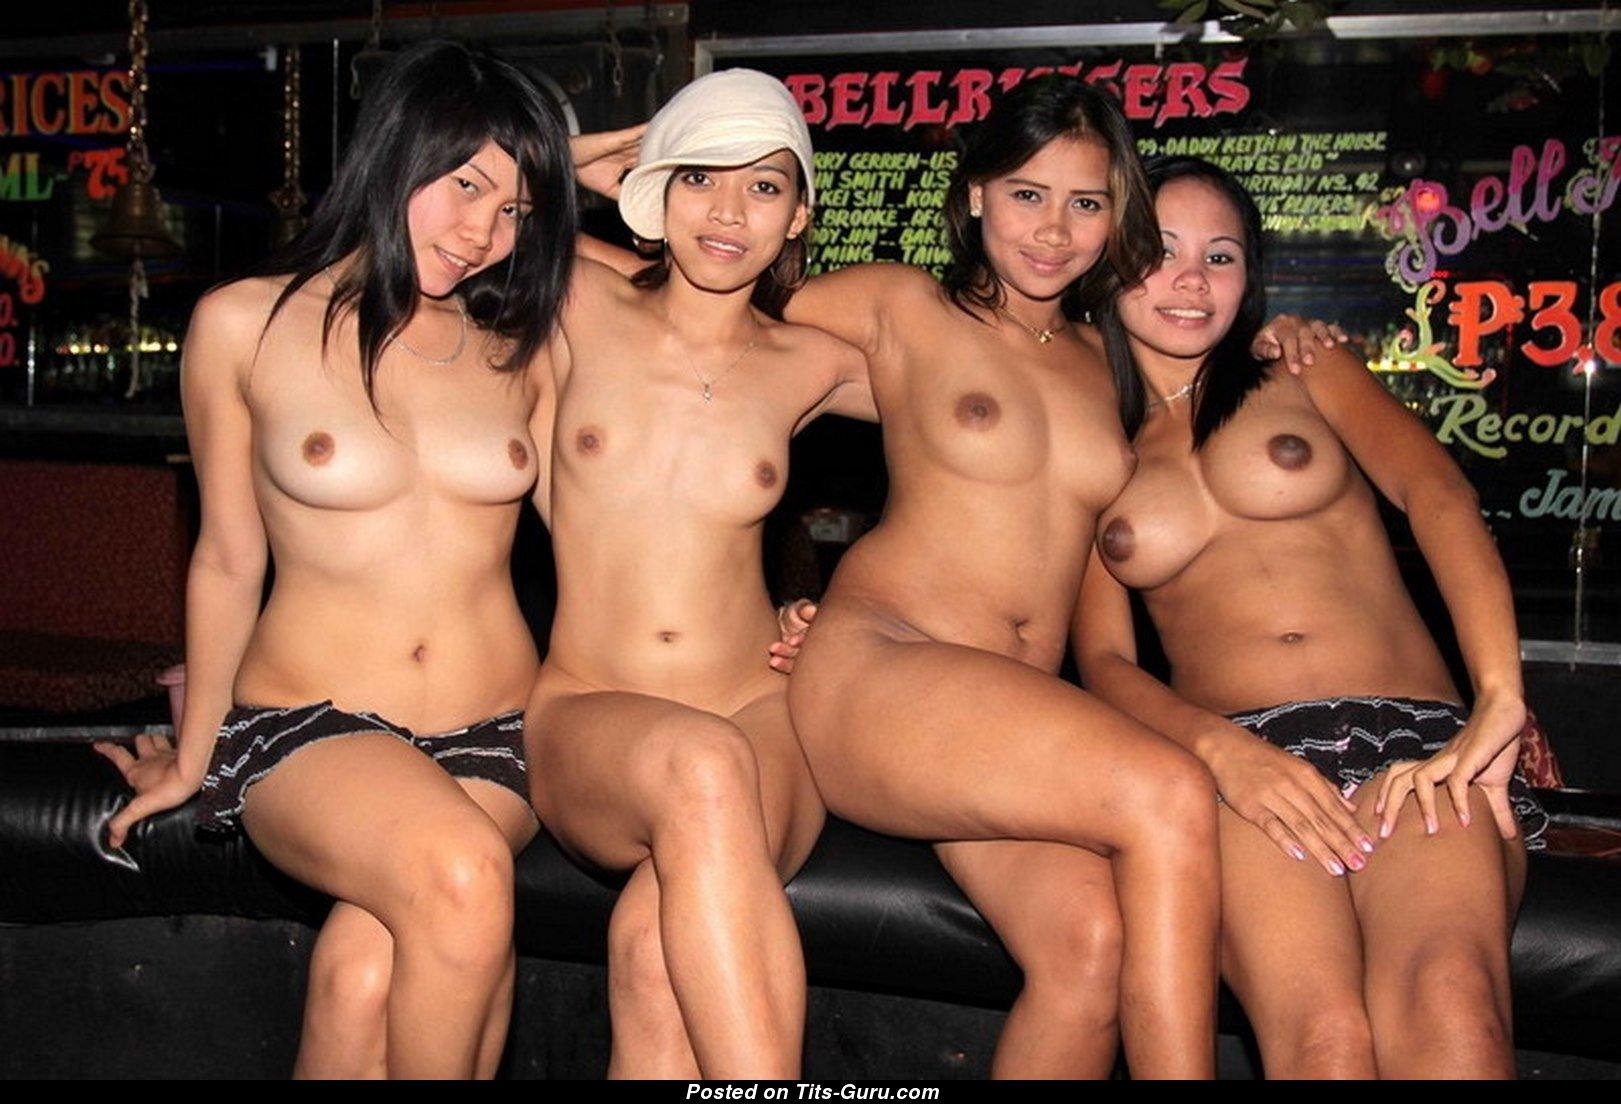 Секс шоу в пхукете